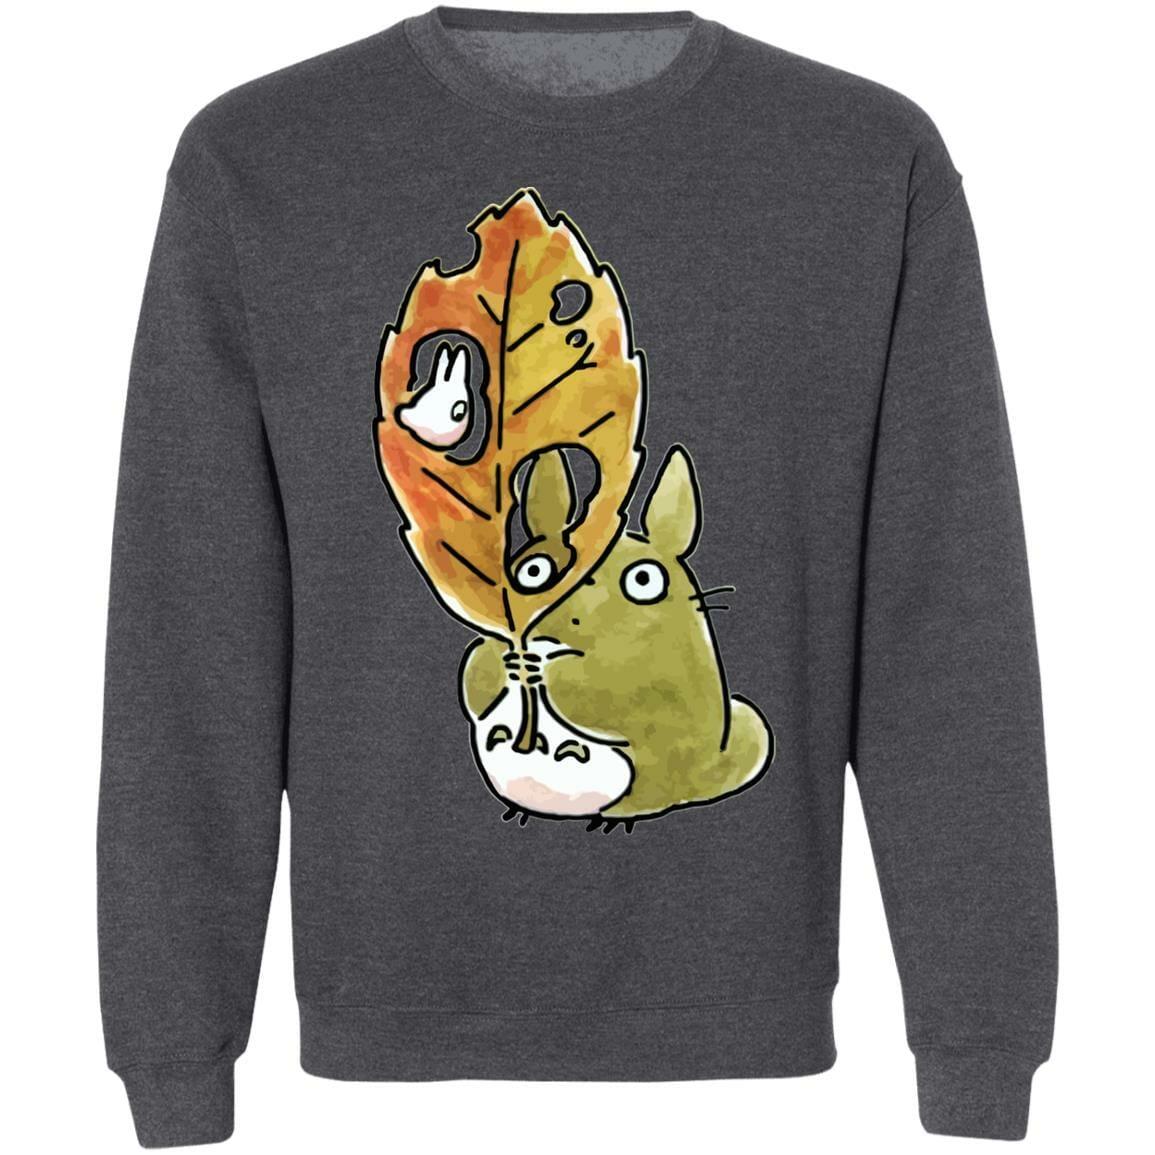 Totoro and the Big Leaf Cute Drawing Sweatshirt